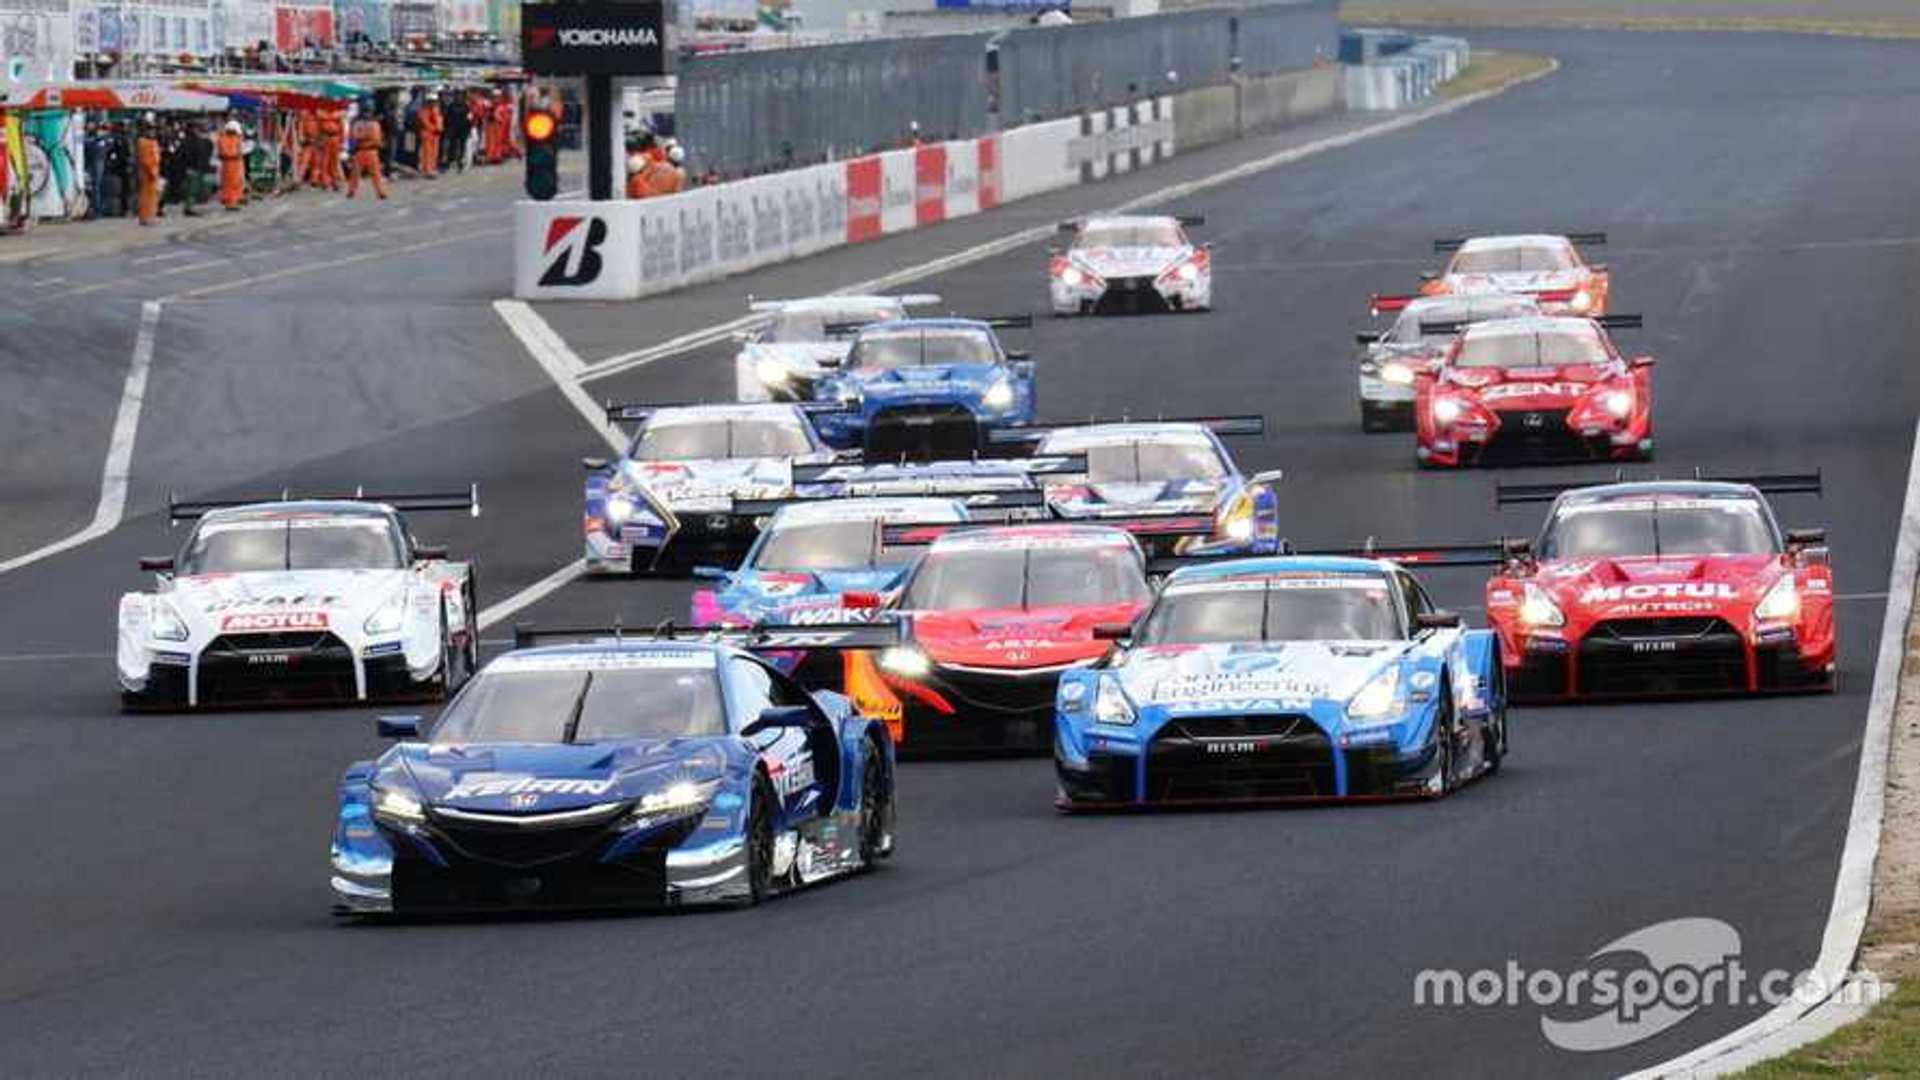 Motorsport.tv to stream 2019 Super GT season for free